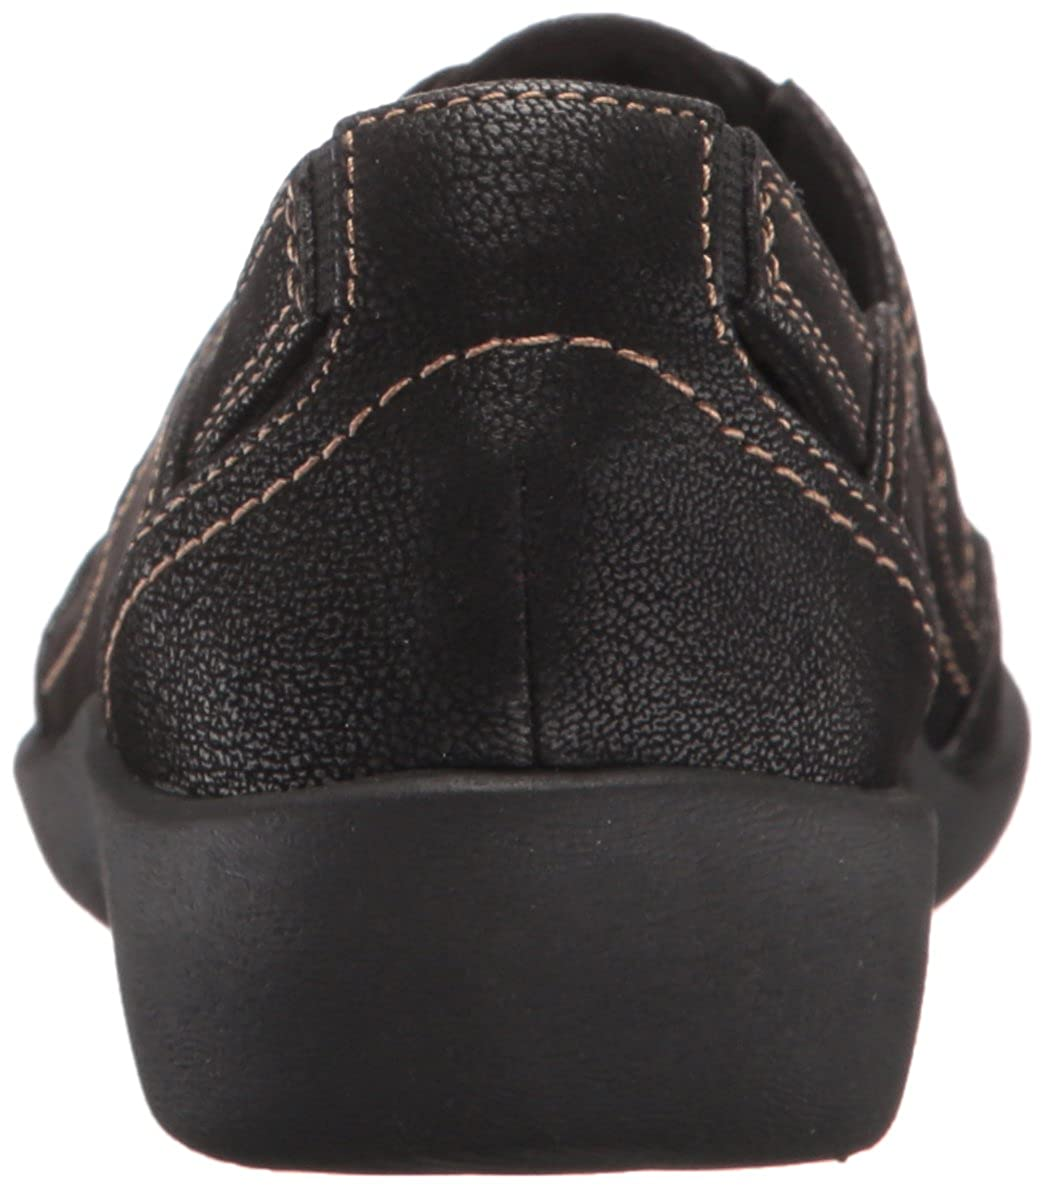 a78345f3c5c Amazon.com  Clarks Women s Sillian Stork Fisherman Sandal  Shoes